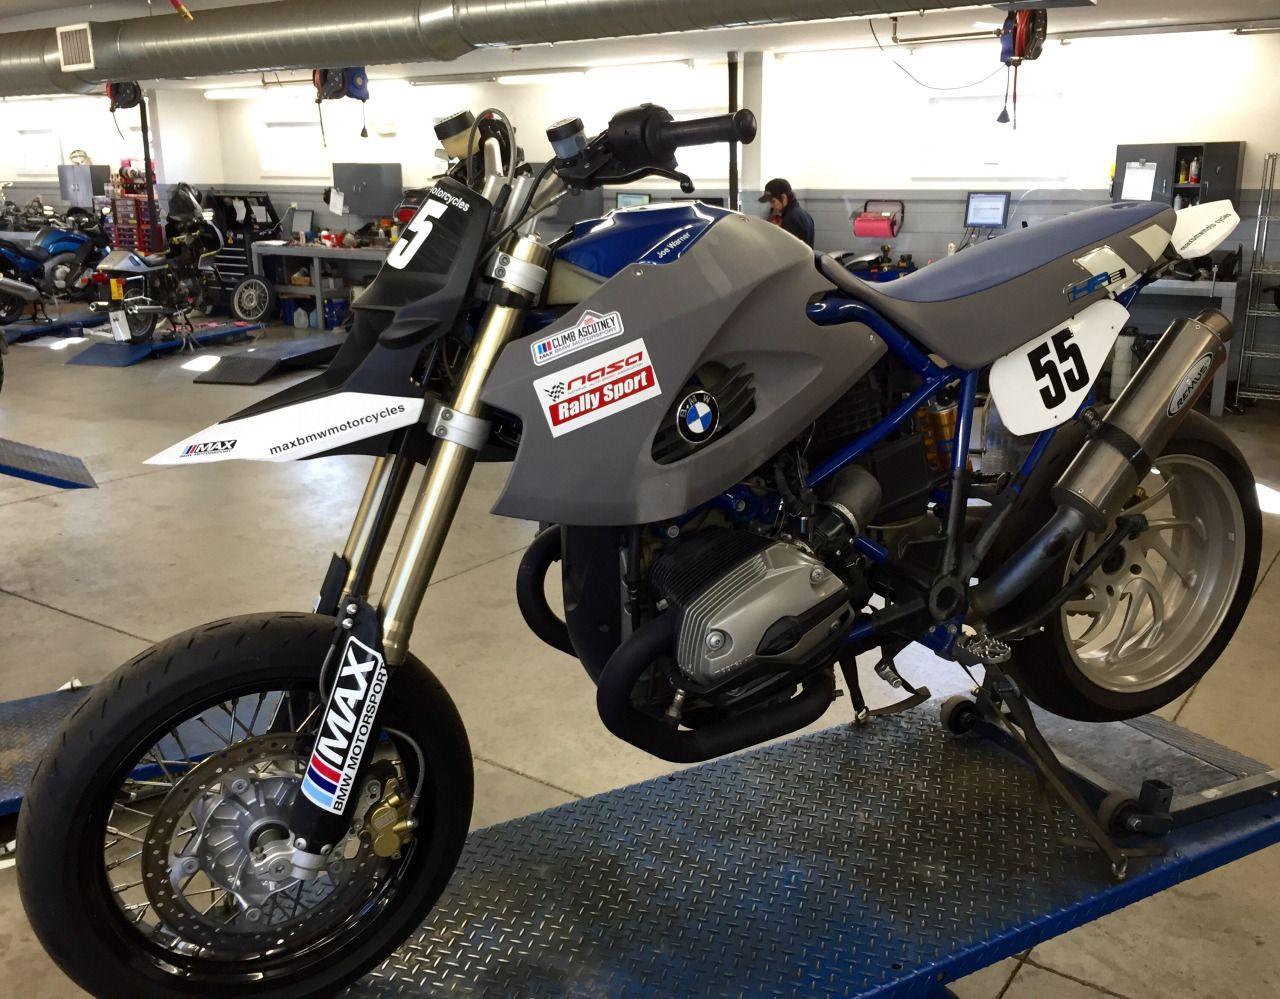 Shop Work At Max Bmw Motorcycles Bmw Motorcycles Bmw Bike Lights